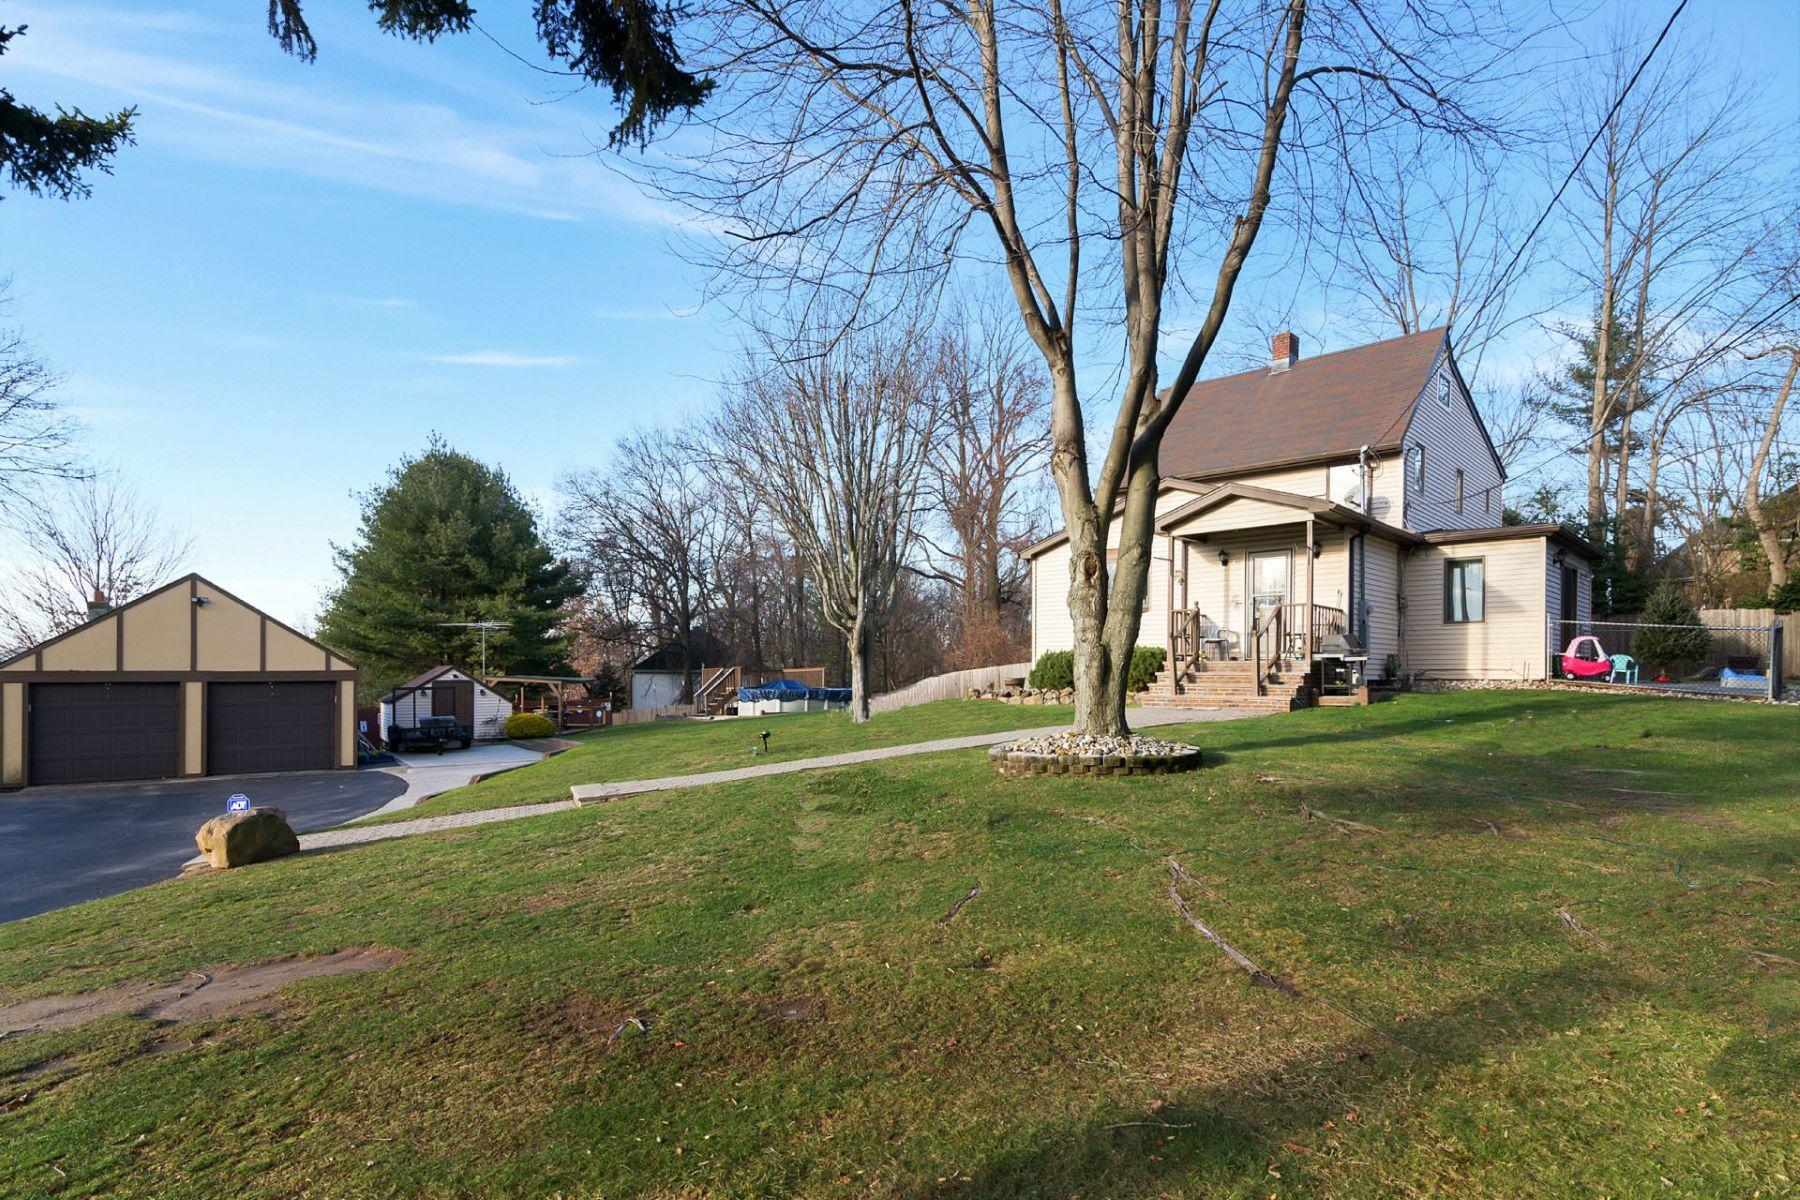 独户住宅 为 销售 在 East Hill Opportunity 376 Anderson Ave 克洛斯特, 新泽西州 07624 美国